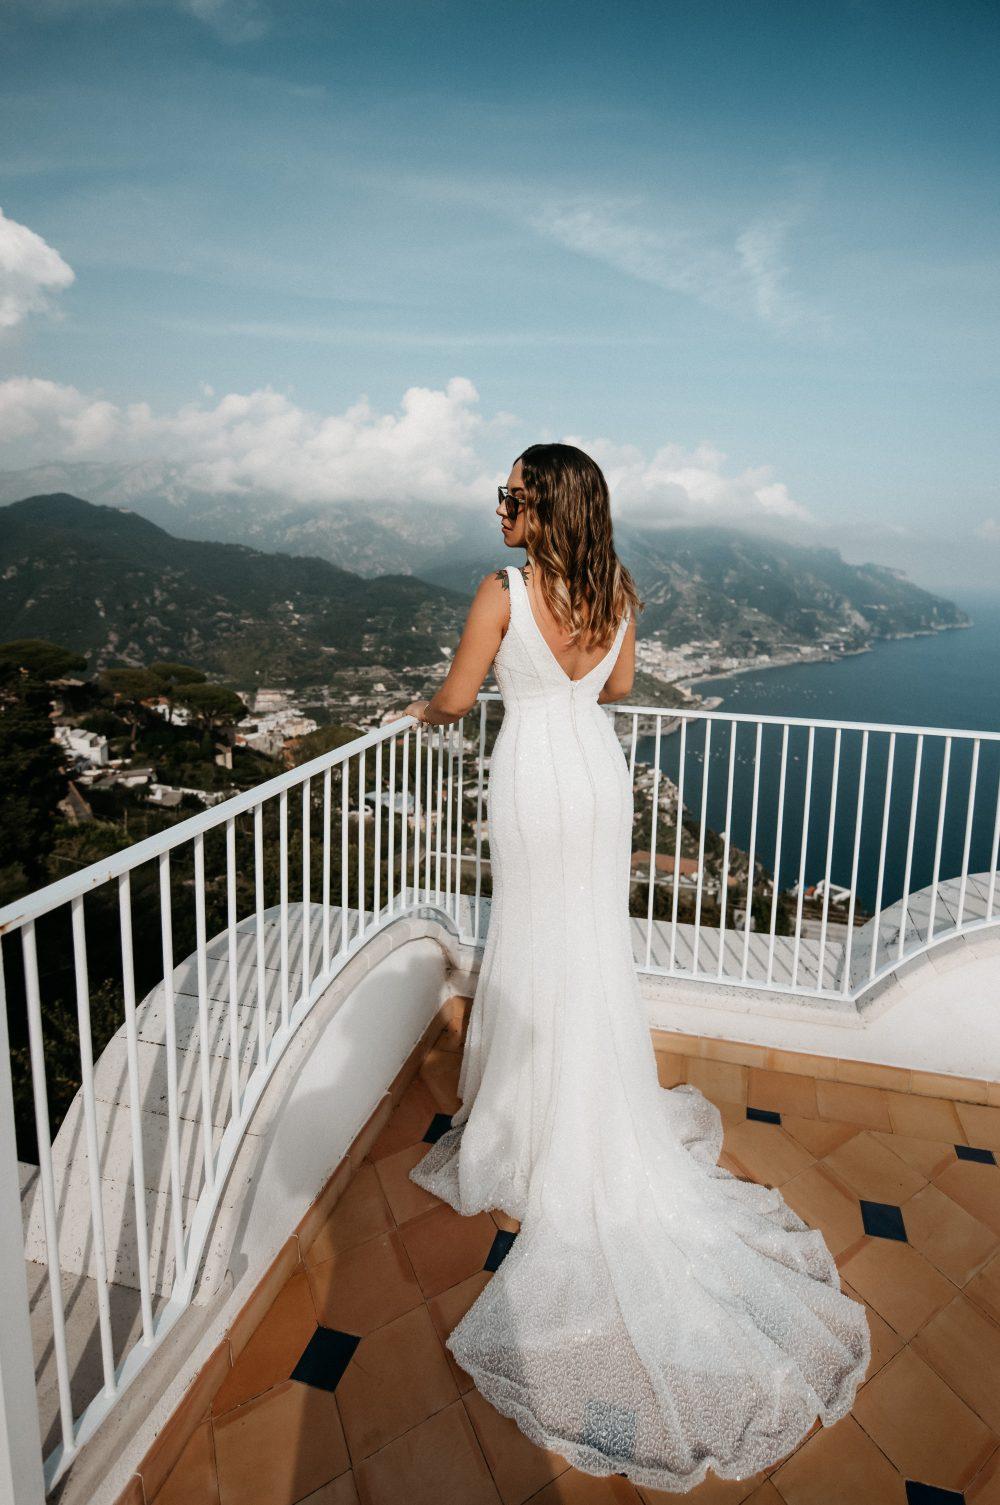 wedding dress for sale dubai